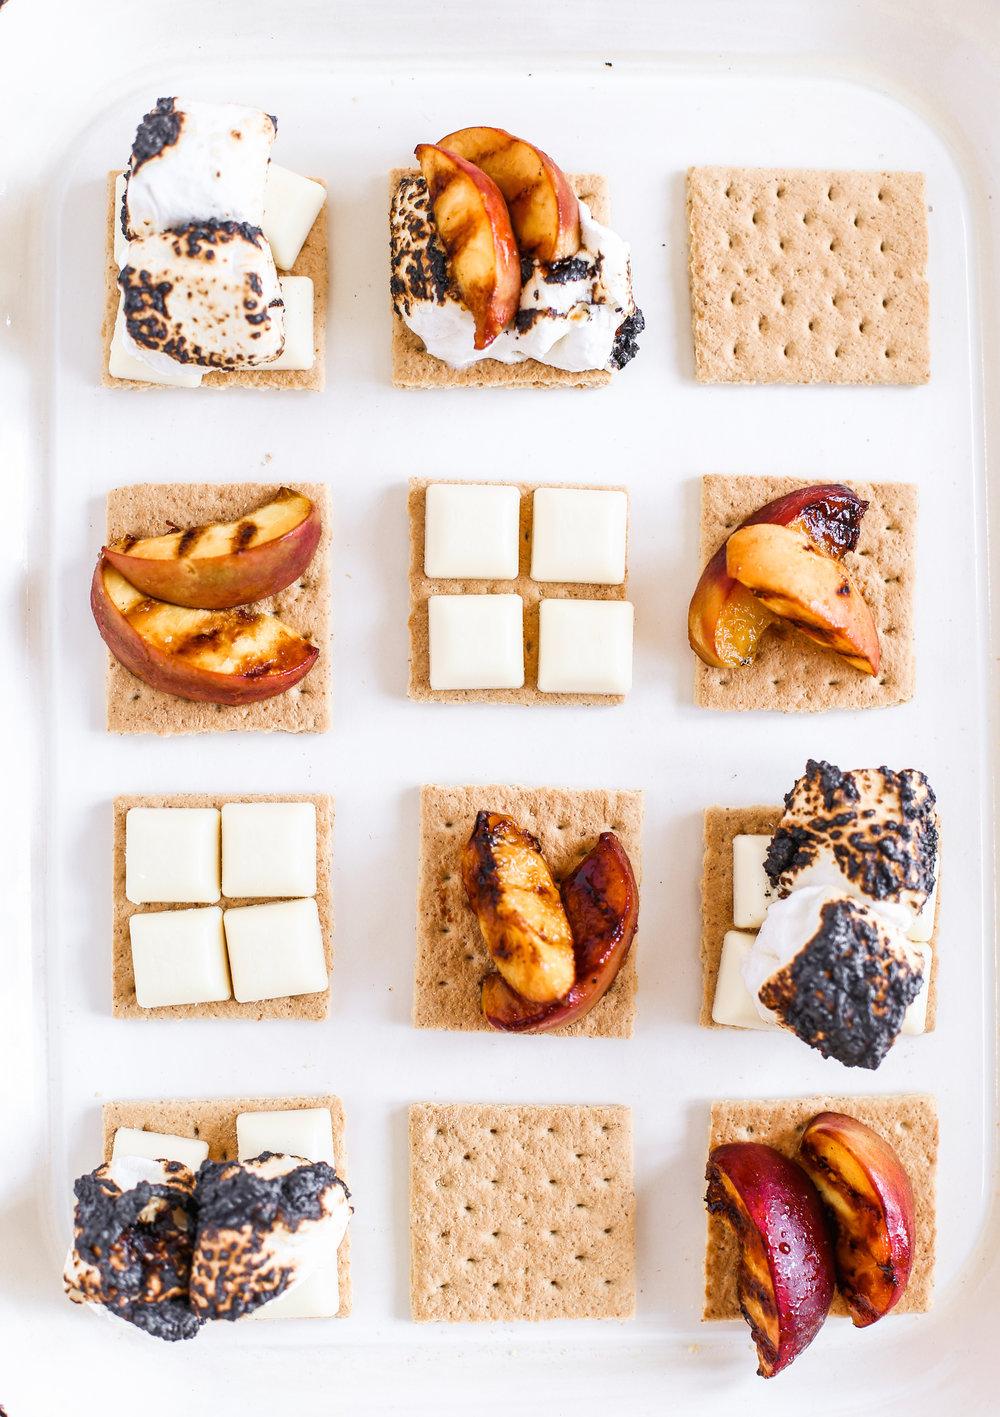 67034-whitechocolatesmeaches-3.jpg